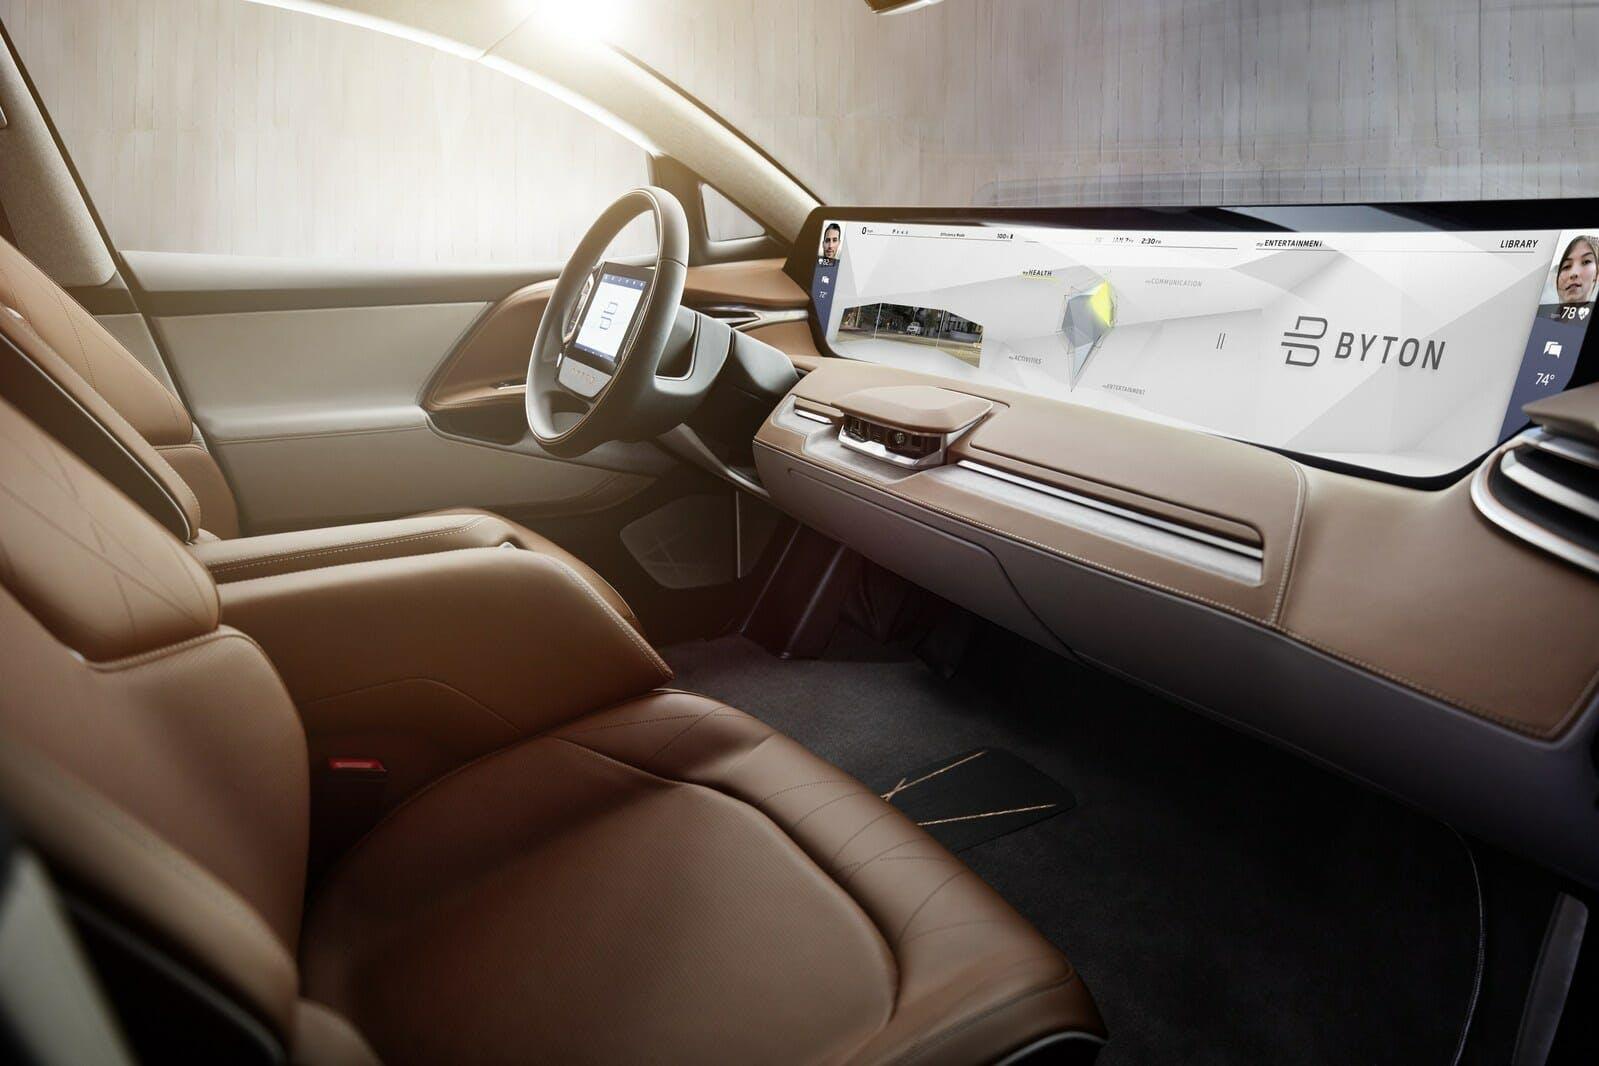 byton electric self-driving car interior display